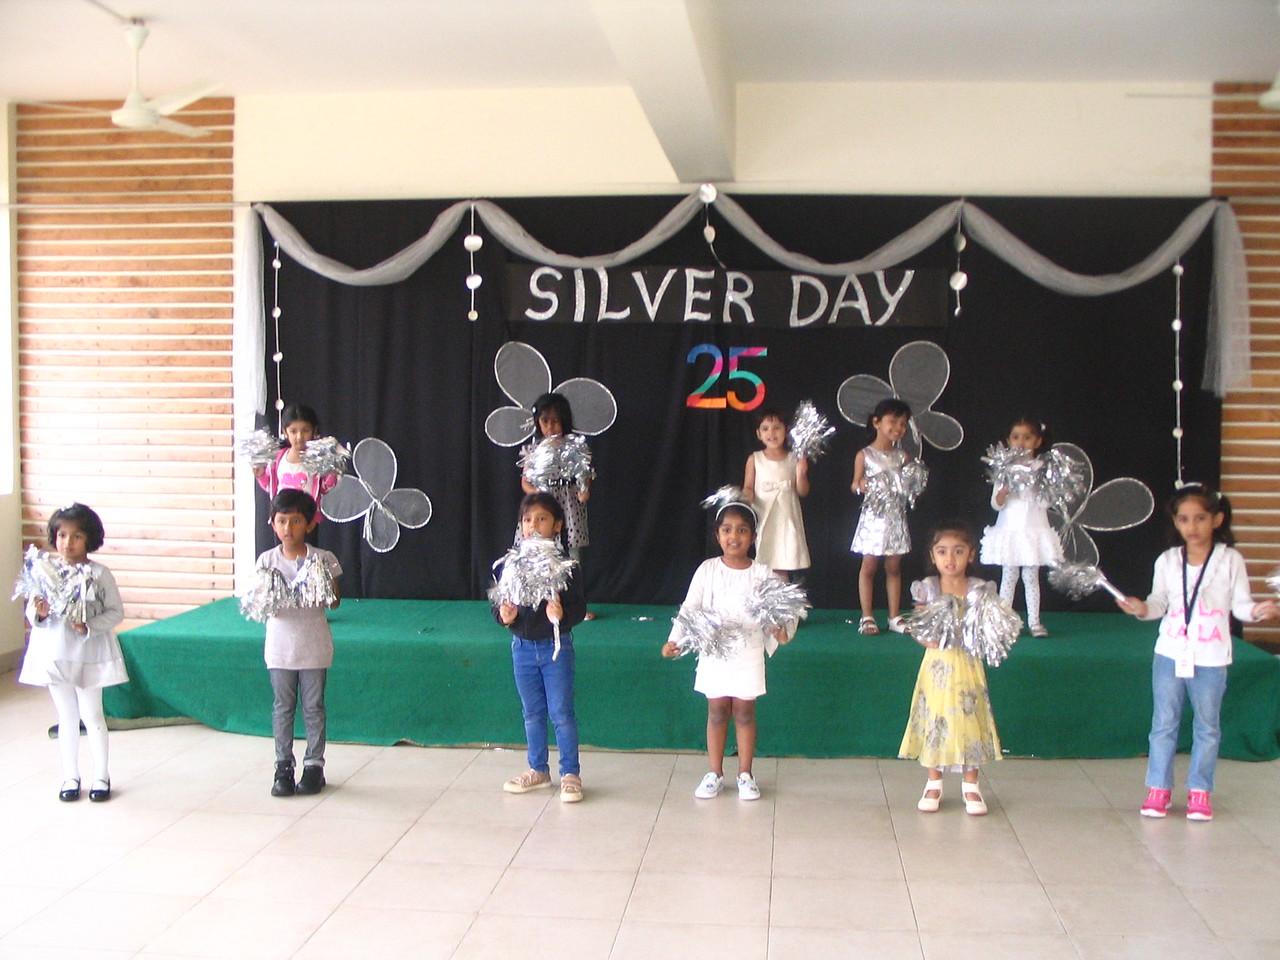 SILVER DAY CELEBRATIONS4